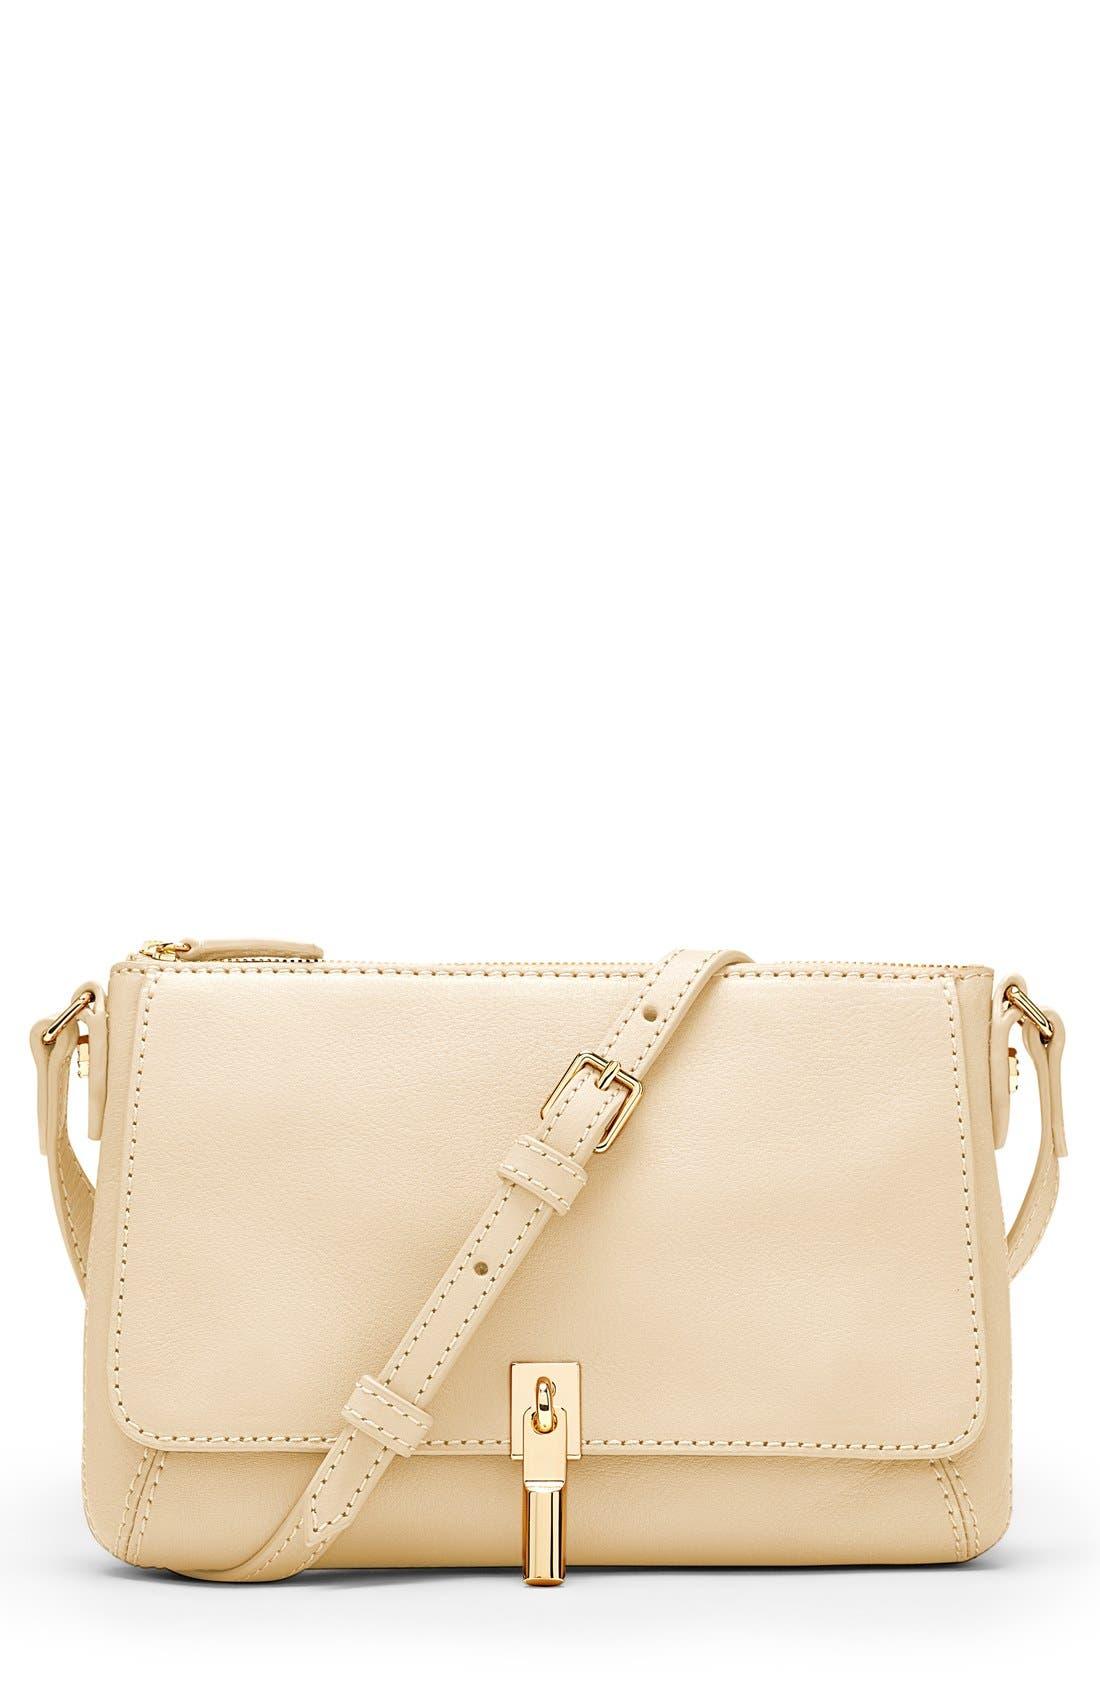 Main Image - Elizabeth and James 'Micro Cynnie' Leather Crossbody Bag